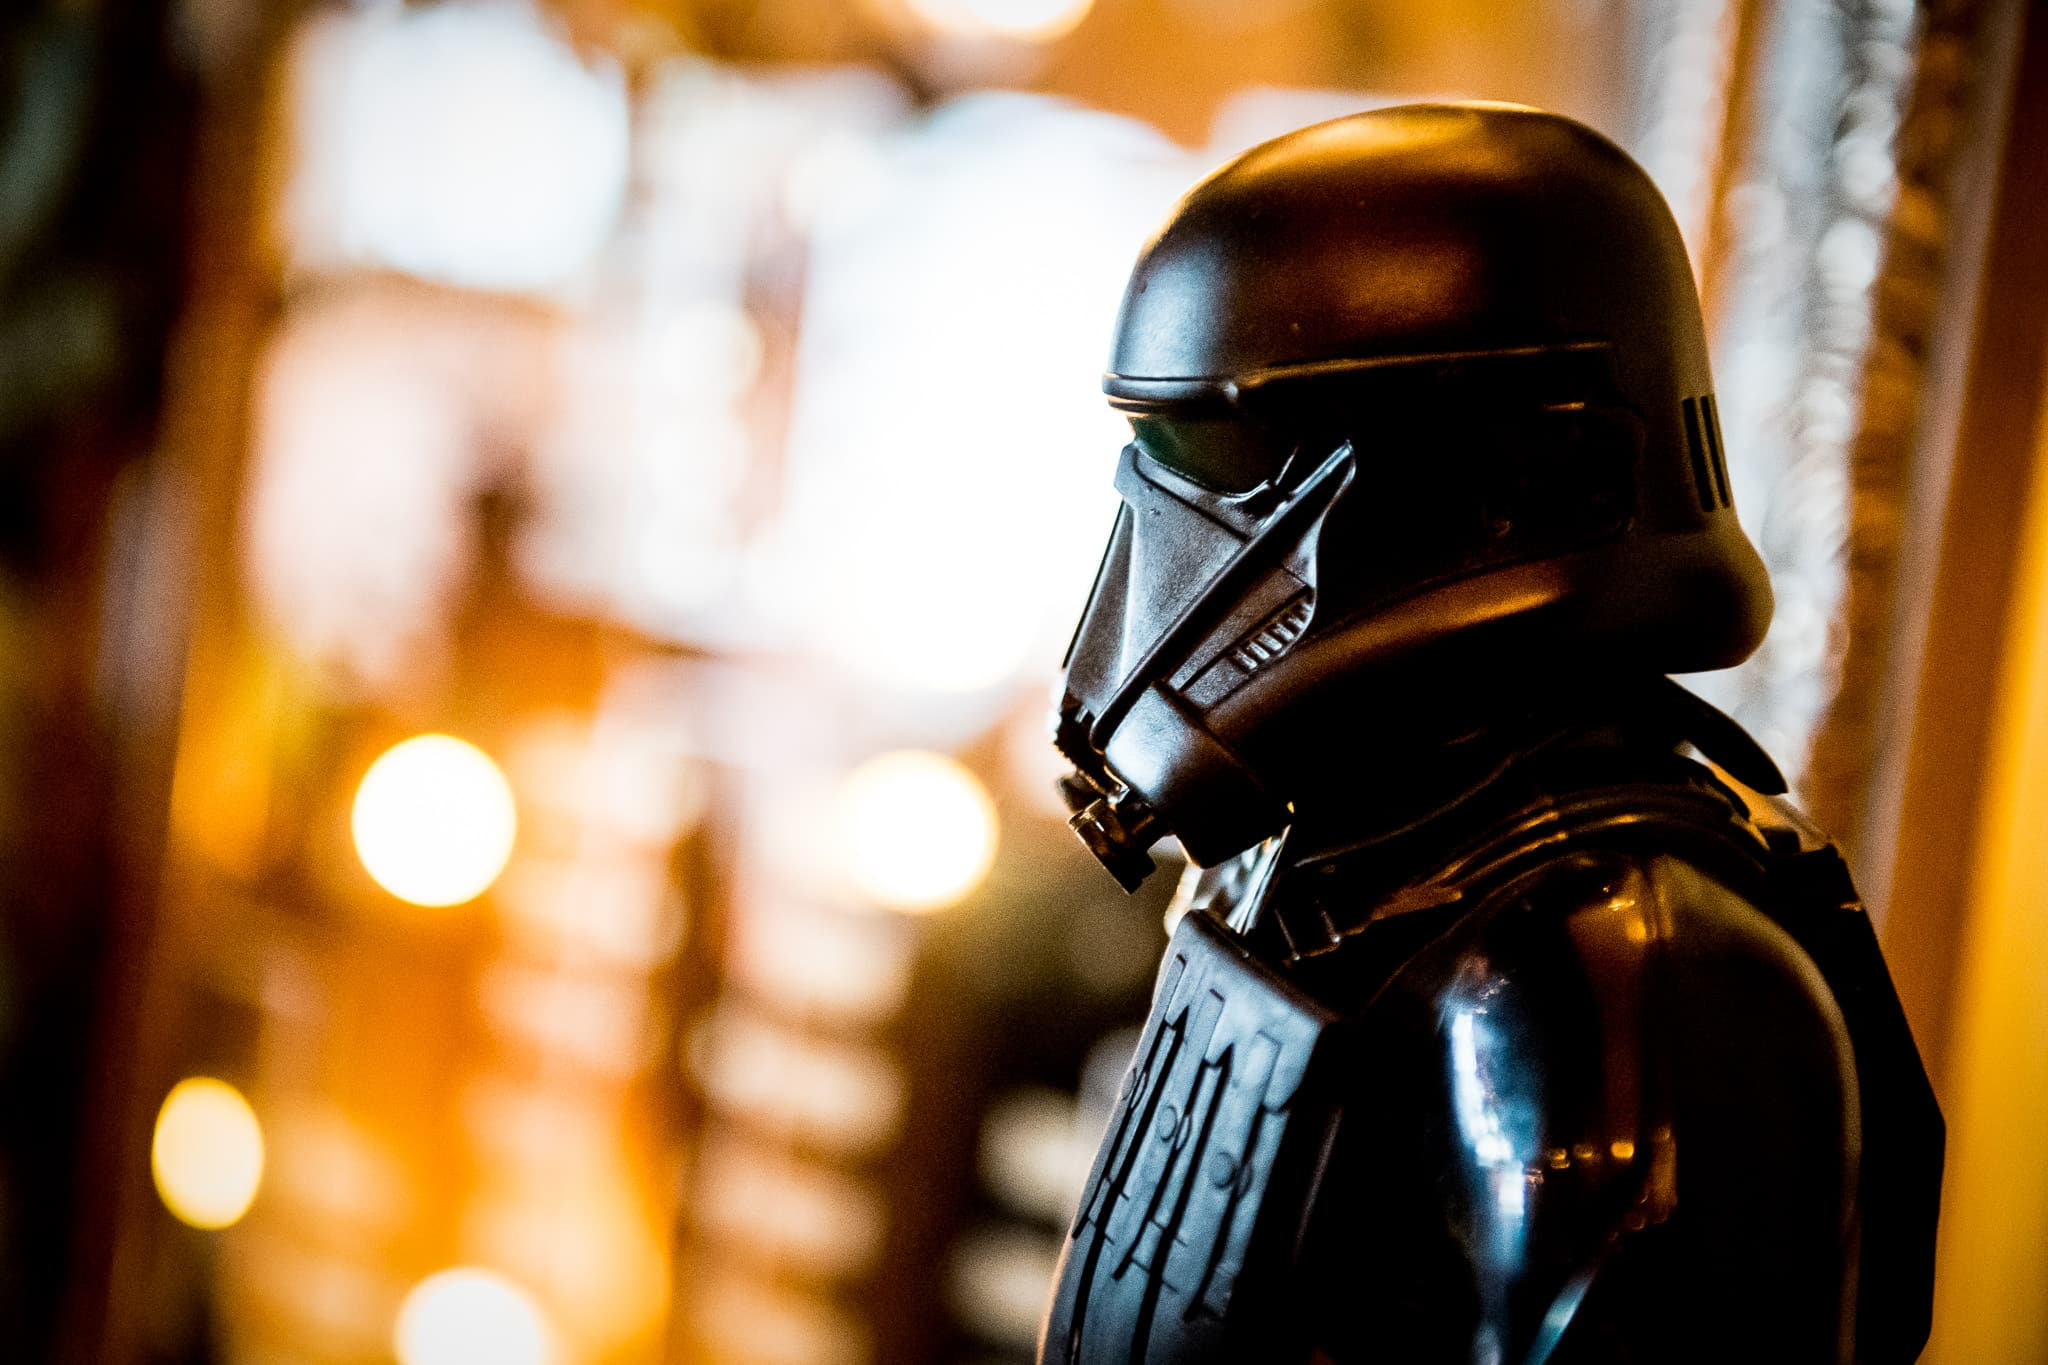 Aster Cafe Star Wars Theme Details 11